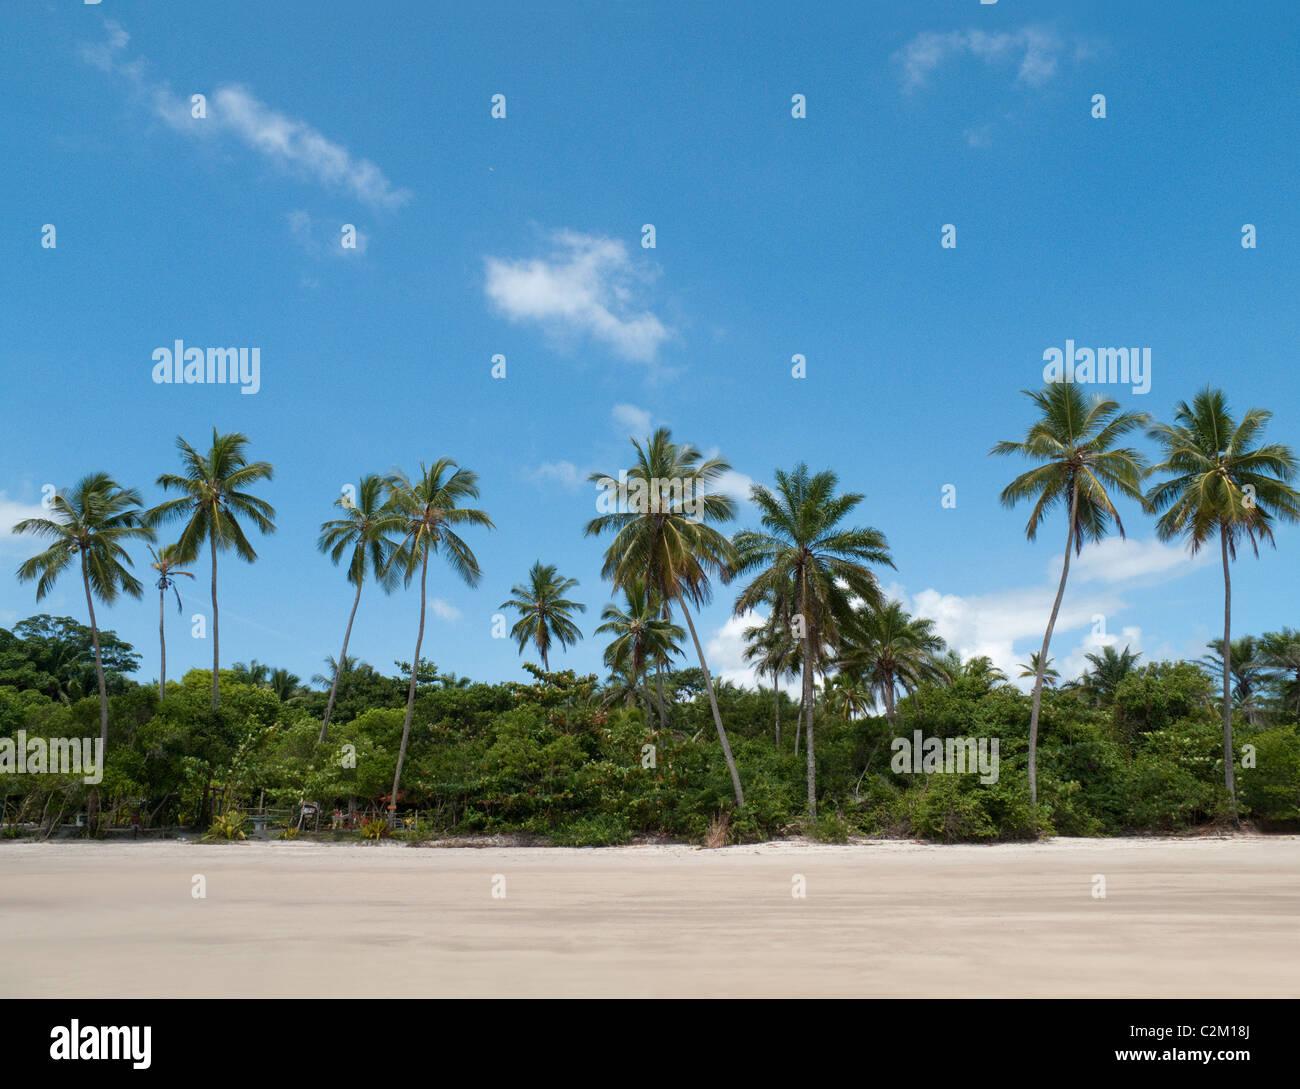 Palmen am Strand, Insel Boipeba, Bahia, Brasilien Stockfoto